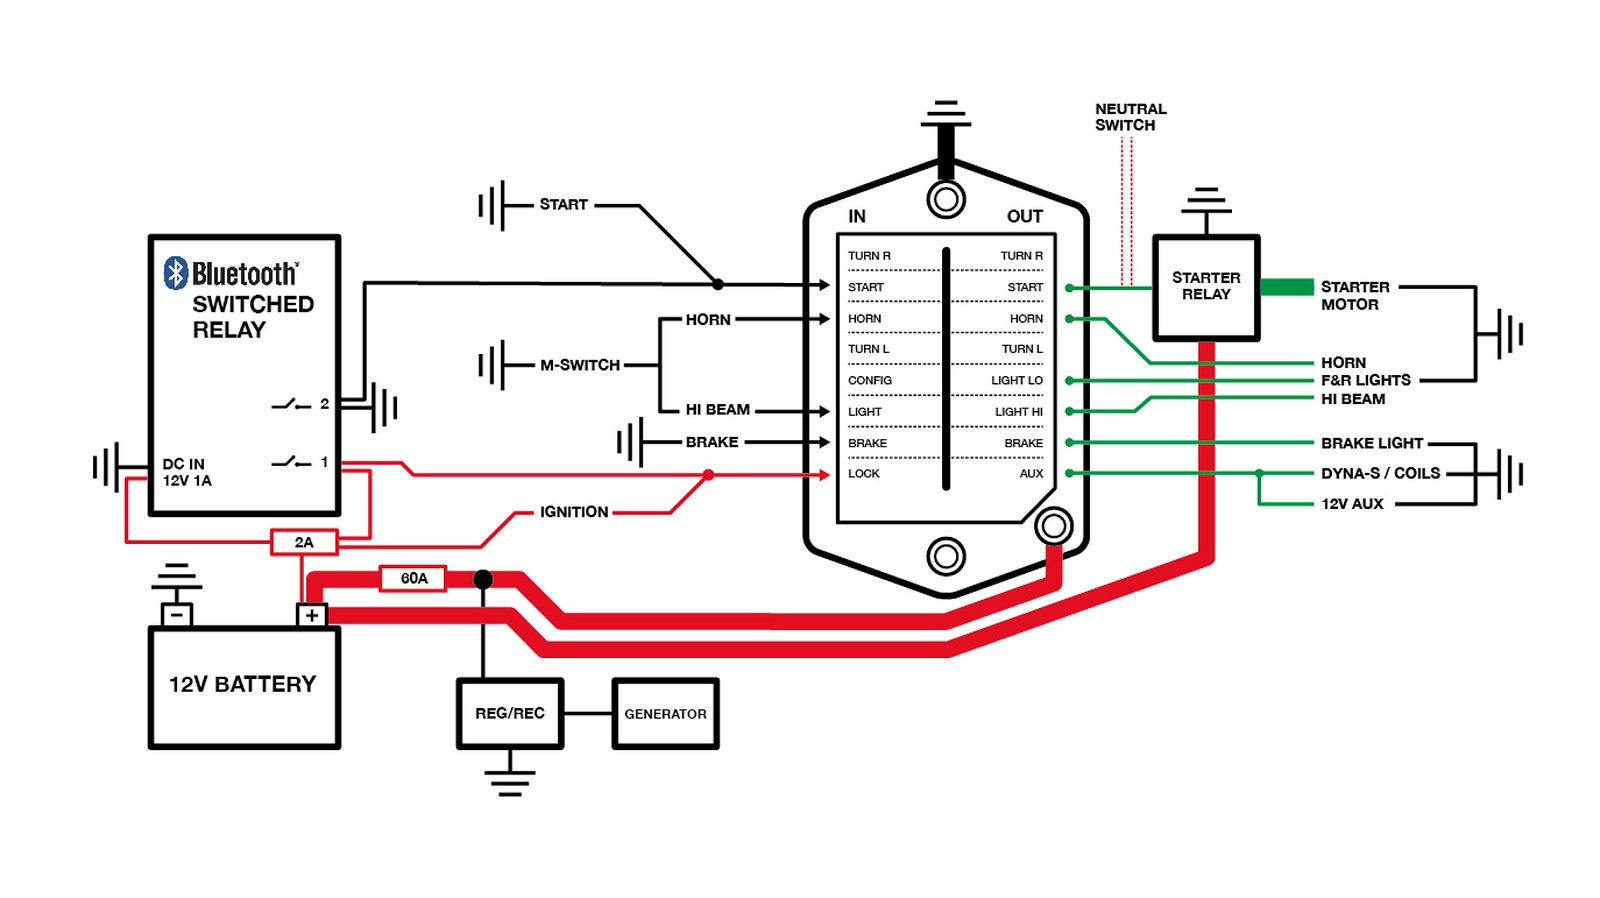 harley accessory plug wiring diagram accessory bracket harley accessories wiring diagram Aiphone Intercom Speaker Wiring Diagram